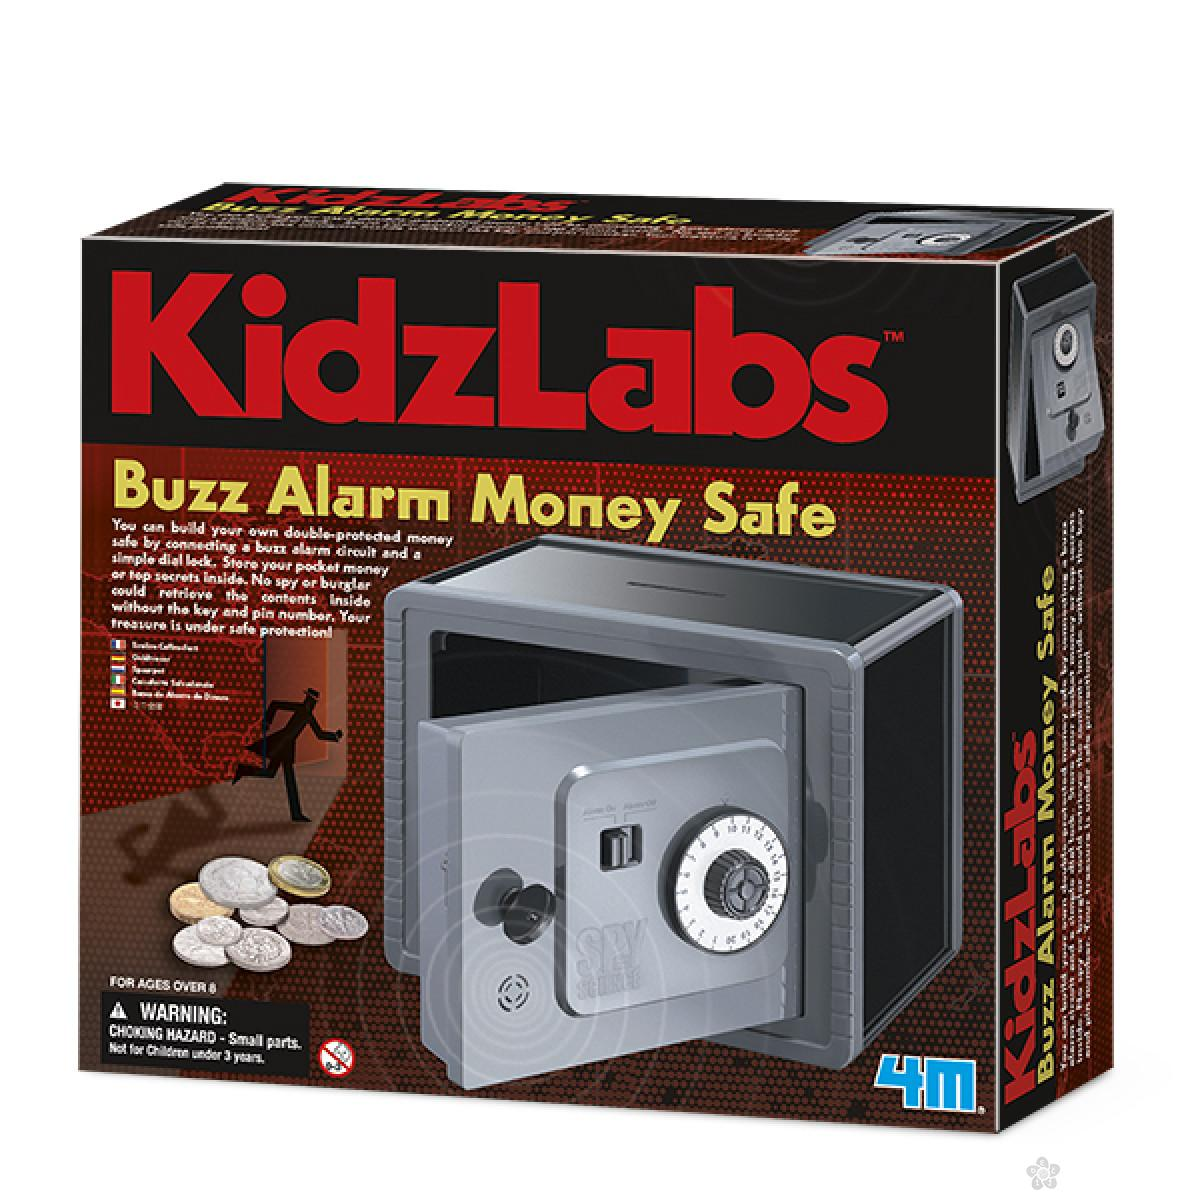 Kidzlabs Buzz alarm money safe, 4M03289